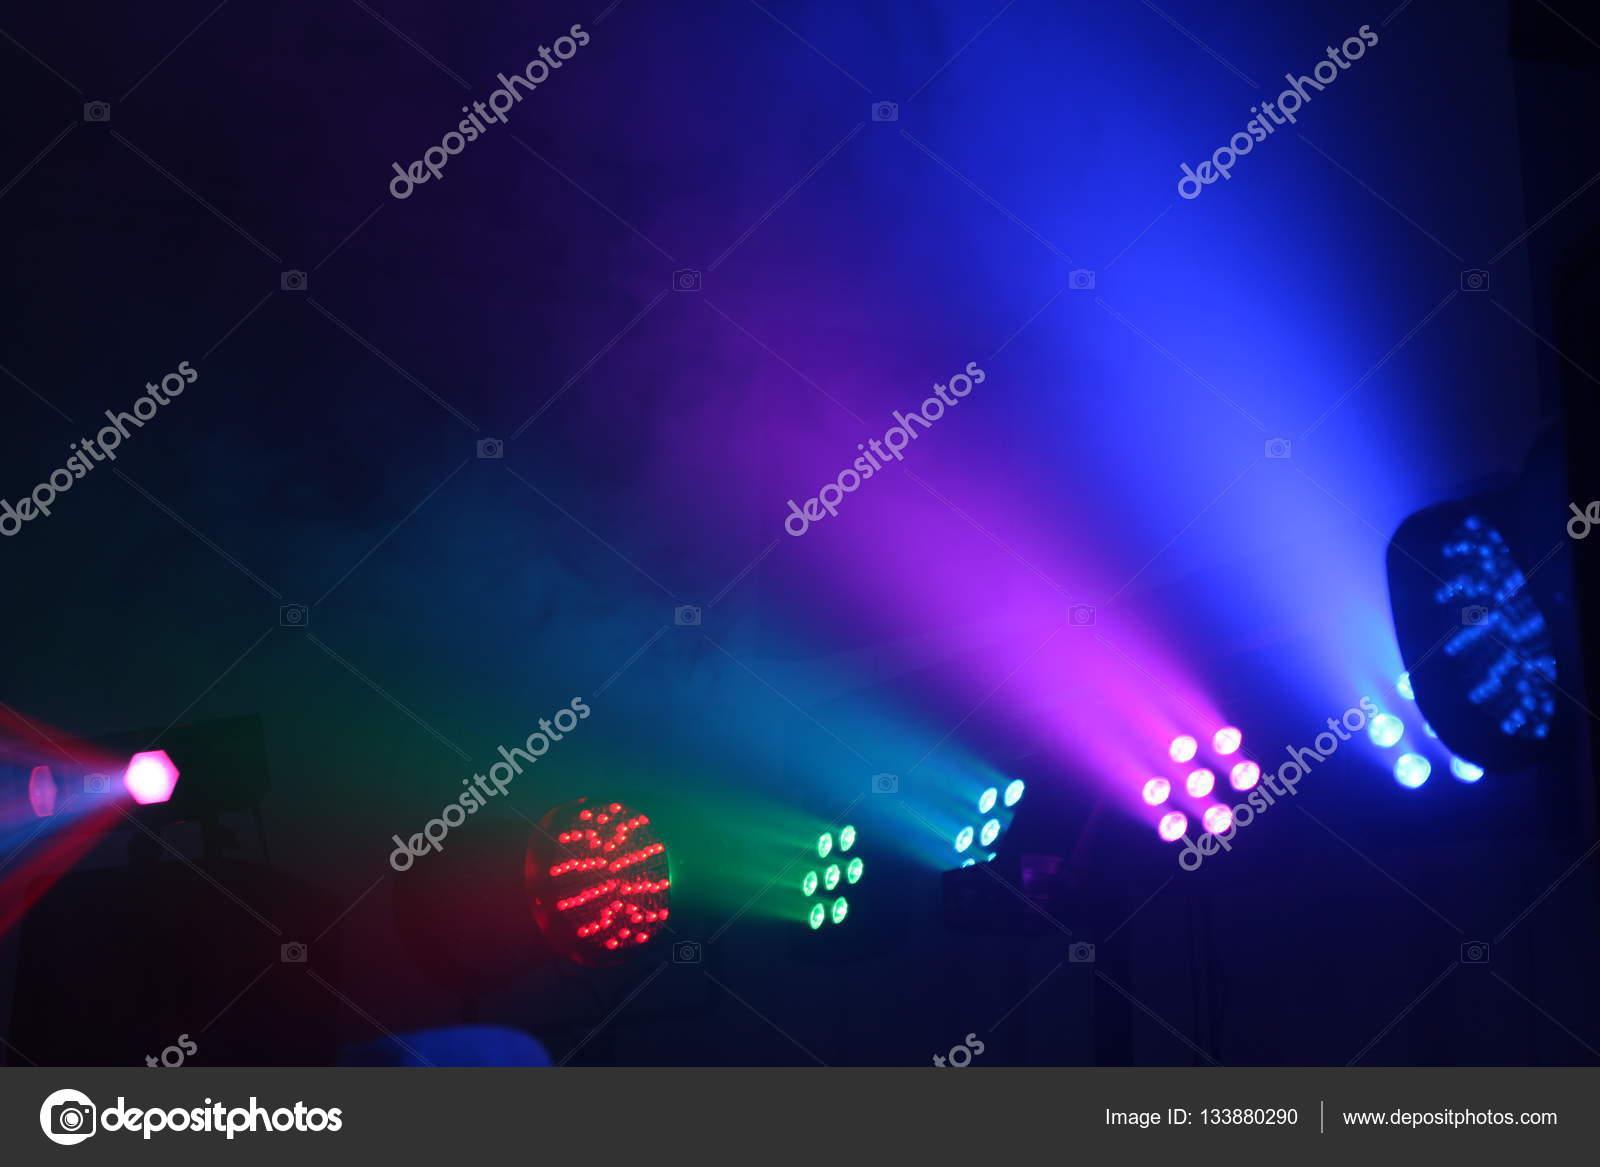 https://st3.depositphotos.com/5278827/13388/i/1600/depositphotos_133880290-stockafbeelding-laser-verlichting-fase-lichten-en.jpg